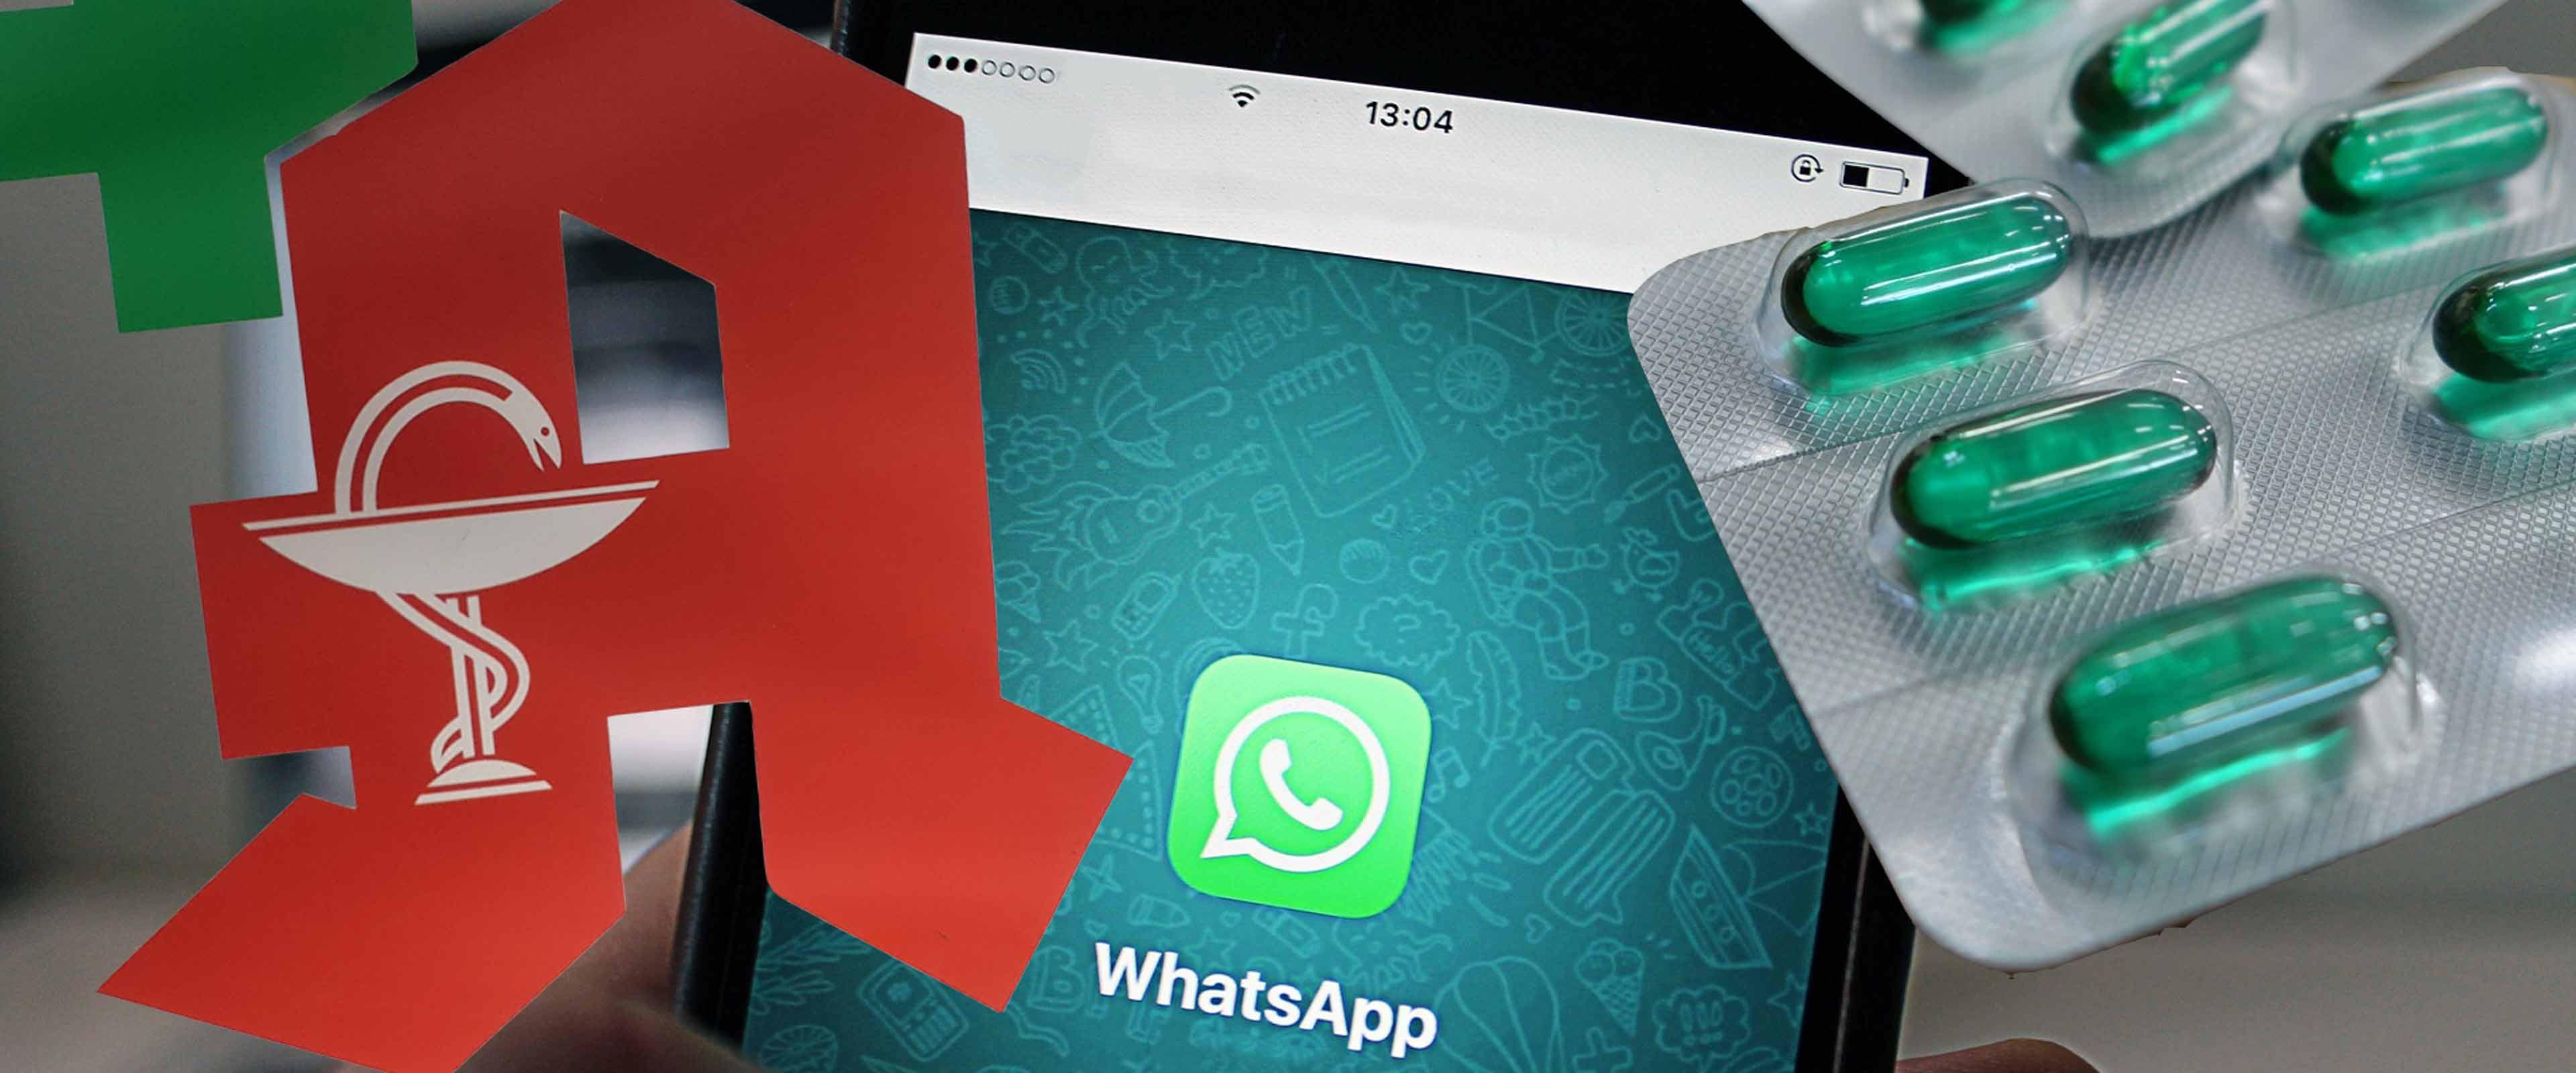 whatsapp-easy-apotheke-whatshealth